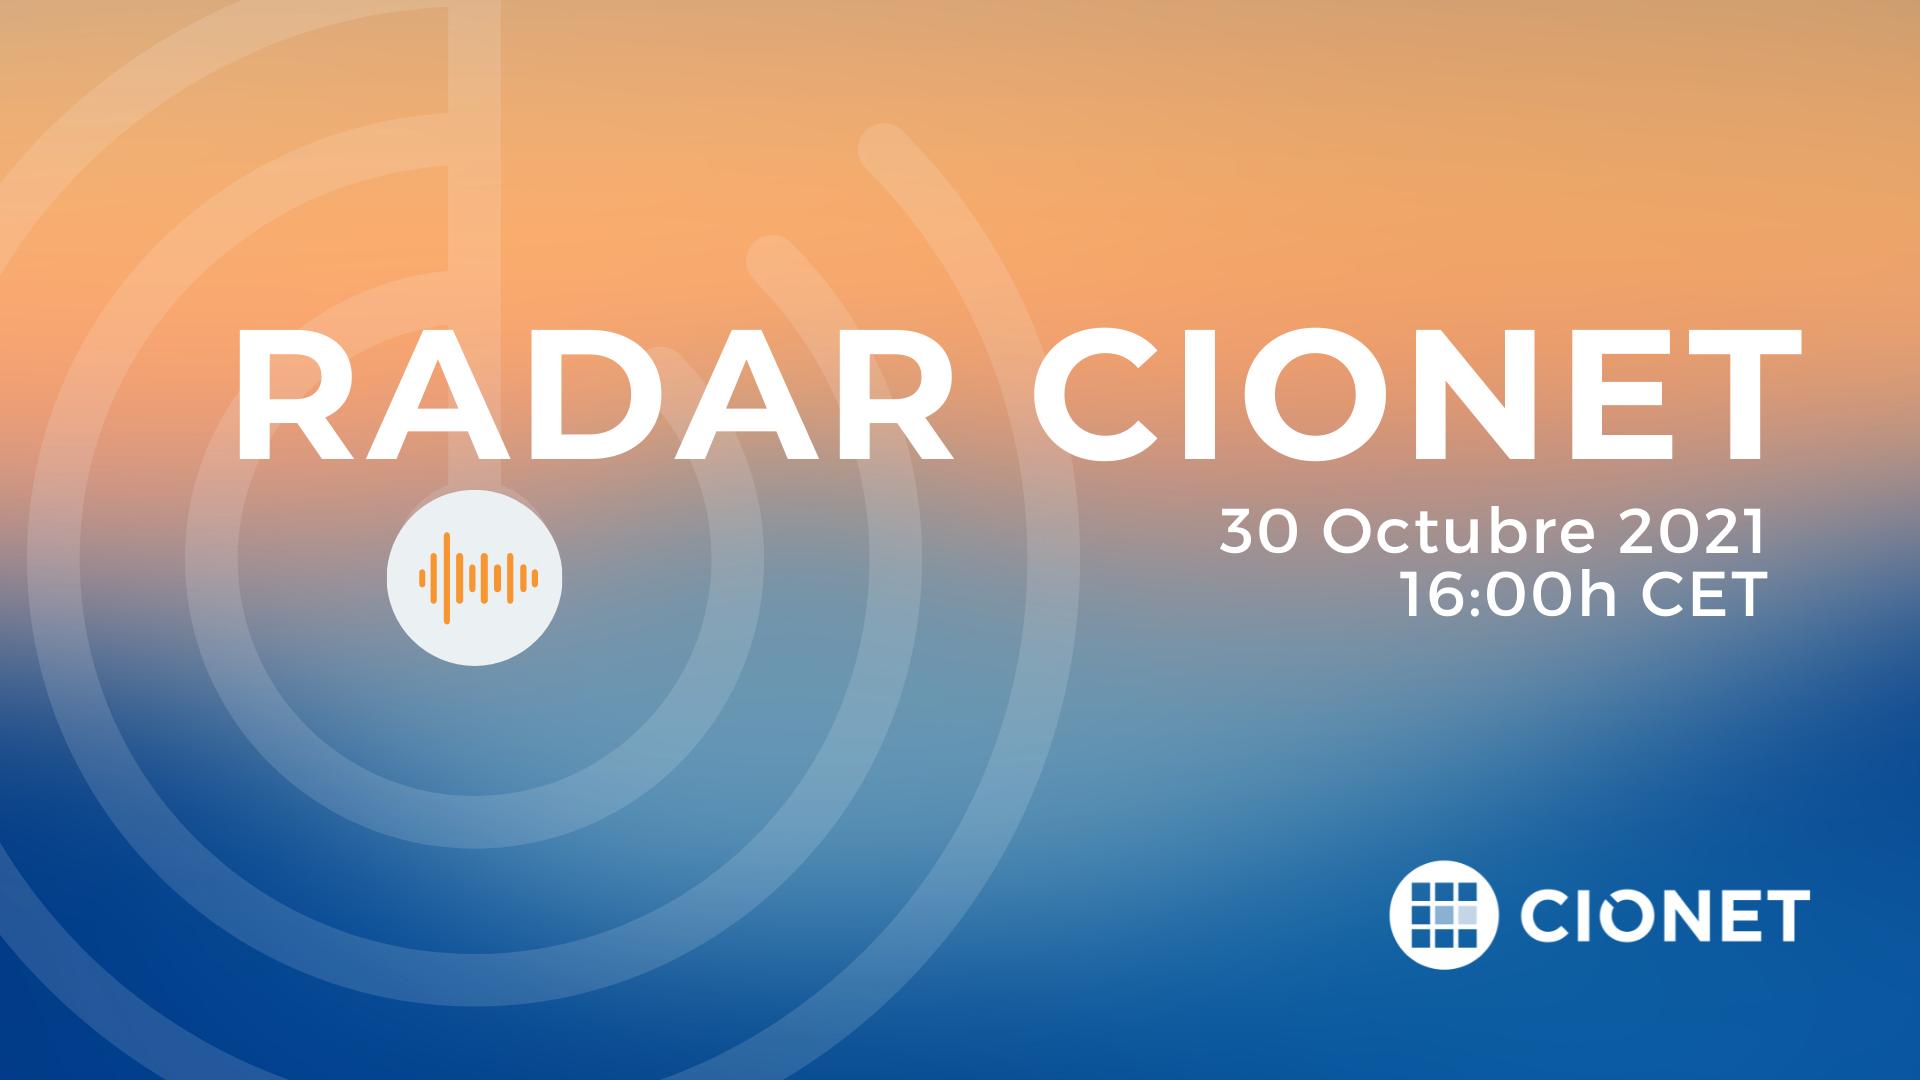 Radar CIONET 202122 (4)